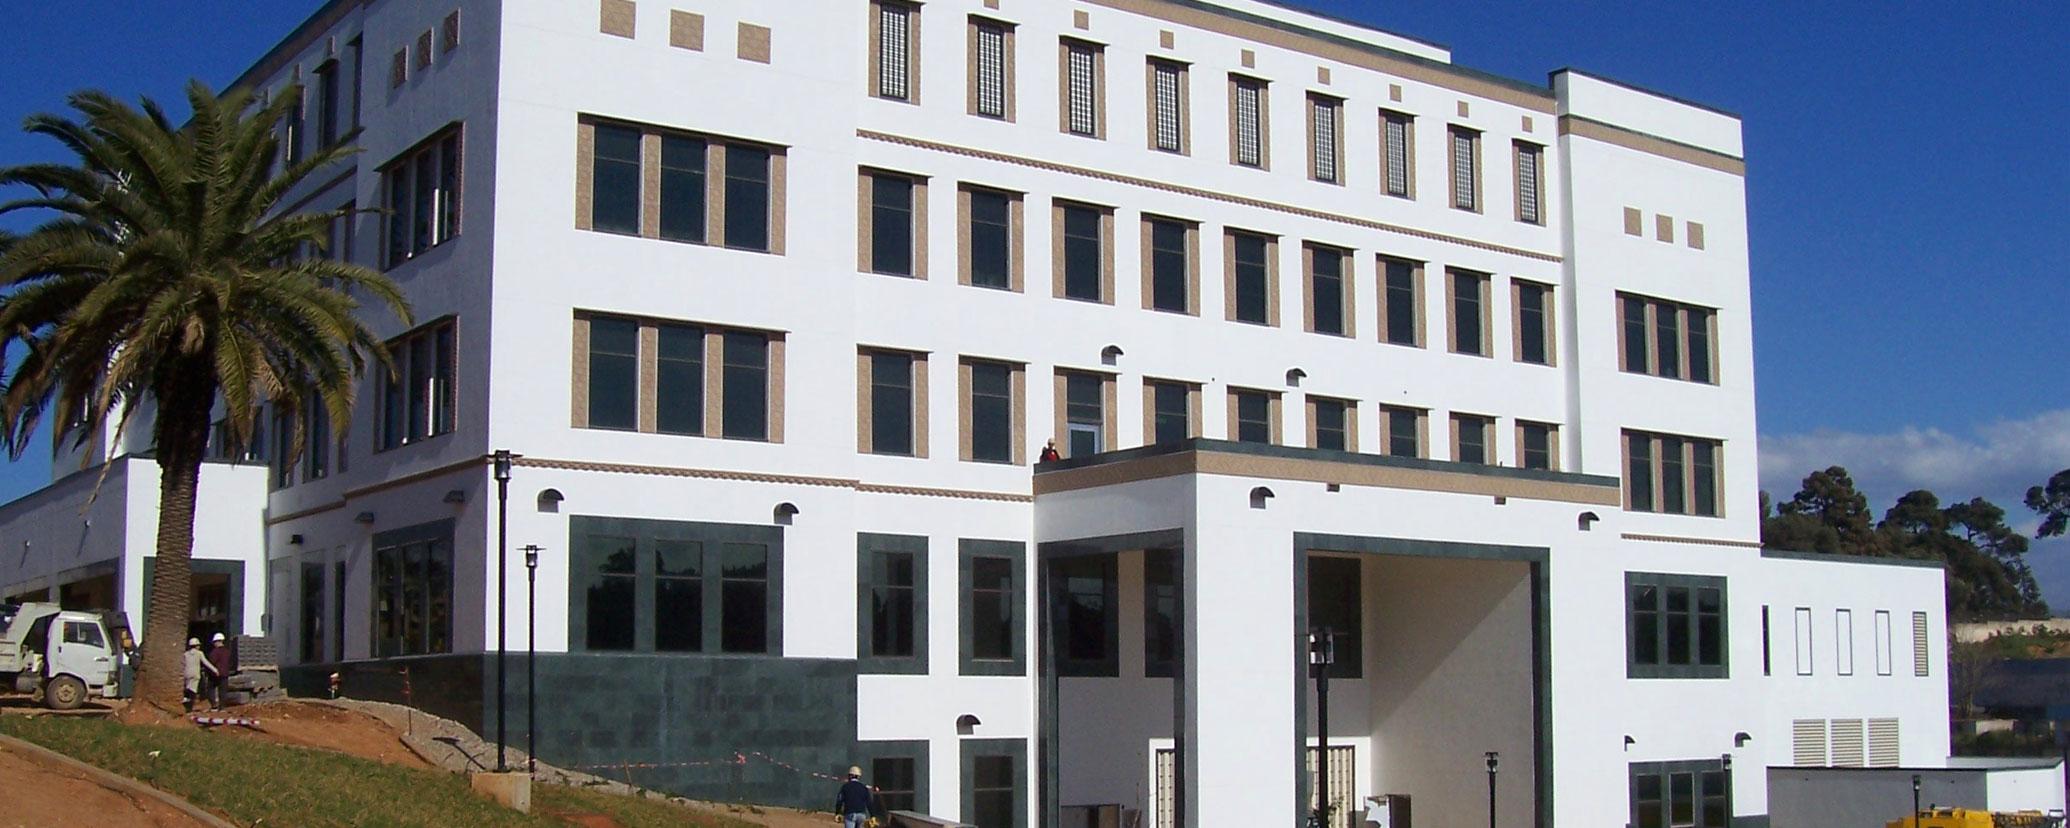 U.S Embassy Algeria, Algerian cultural heritage sites, u.s.embassytunisia, u.s.embassy algeriafacebook, u.s.embassyinalgeriareopen, u.s.embassy algeriavisa, u.s.embassyinalgeriaappointment, u.s.embassyinalgeriaemail, us embassyalgiers twitter